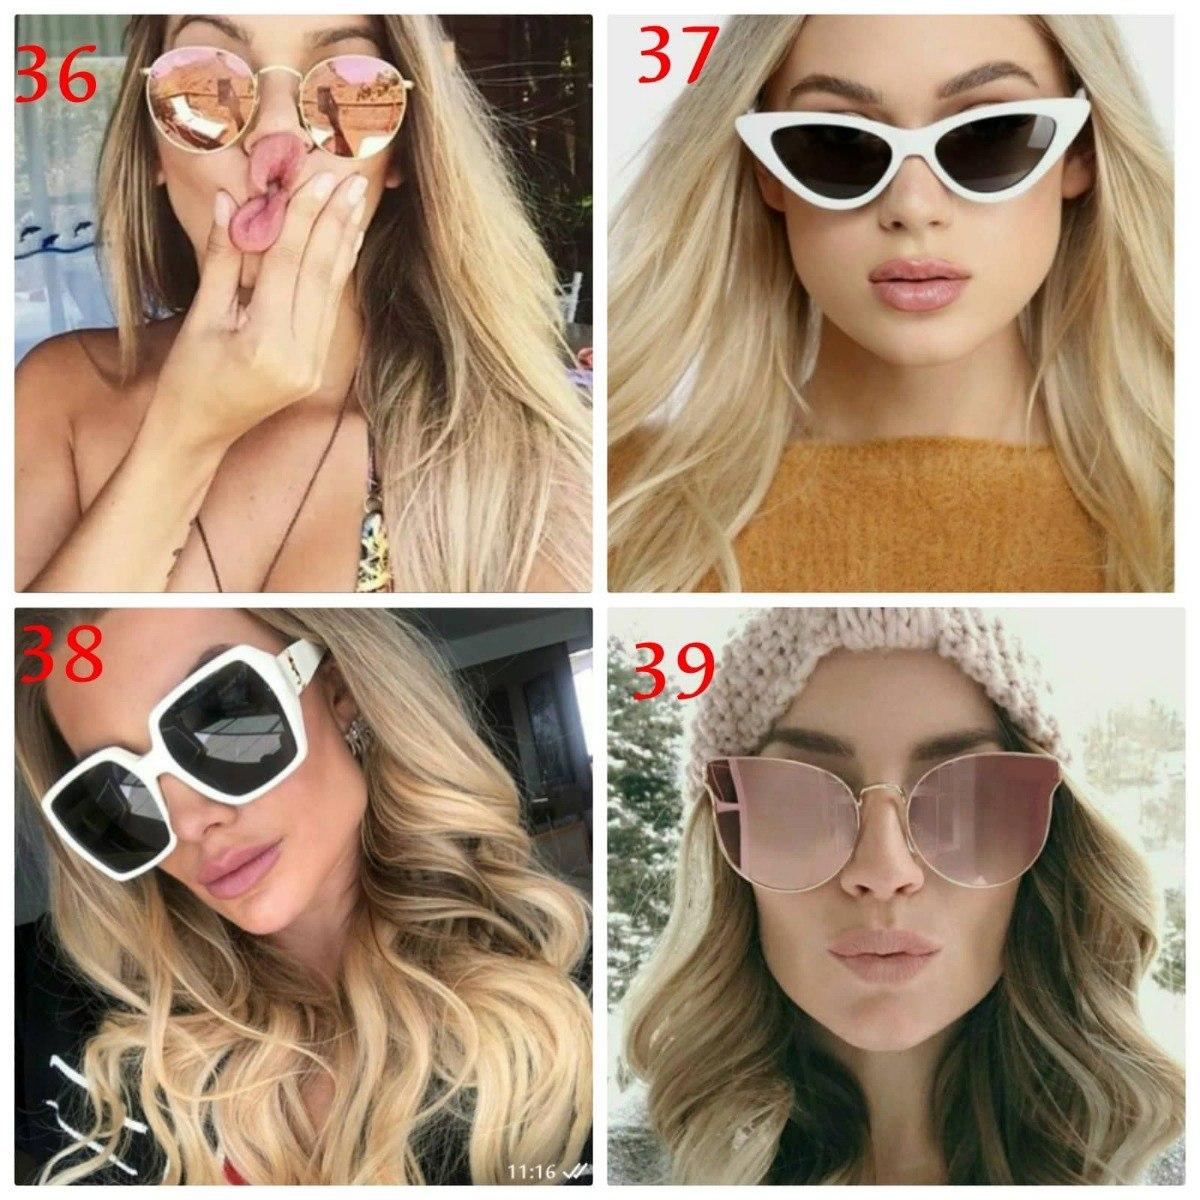 kit 15 óculos preço de fábrica revenda barato atacado oferta. Carregando  zoom. d37473f38b